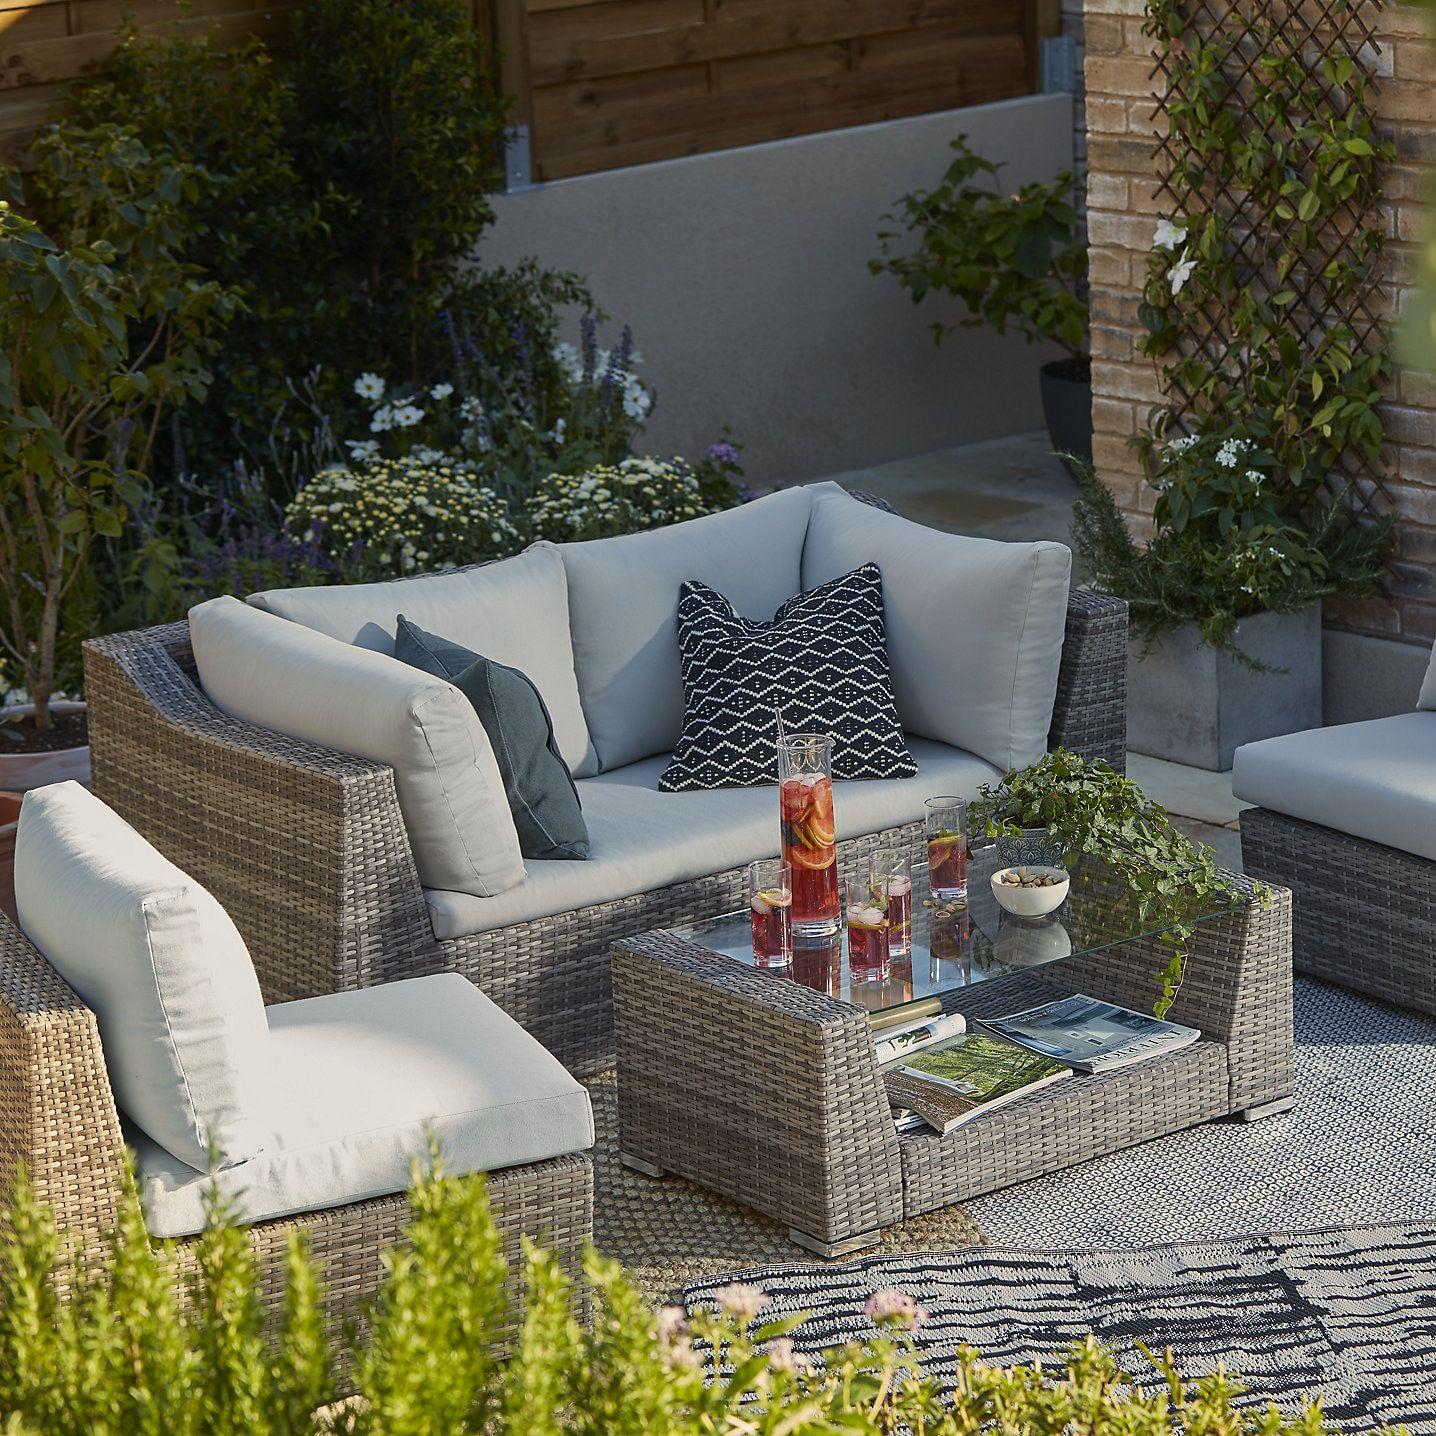 Maevea Rattan Effect 4 Seater Coffee Set Garden Furniture Sets Rattan Outdoor Furniture Rattan Garden Furniture